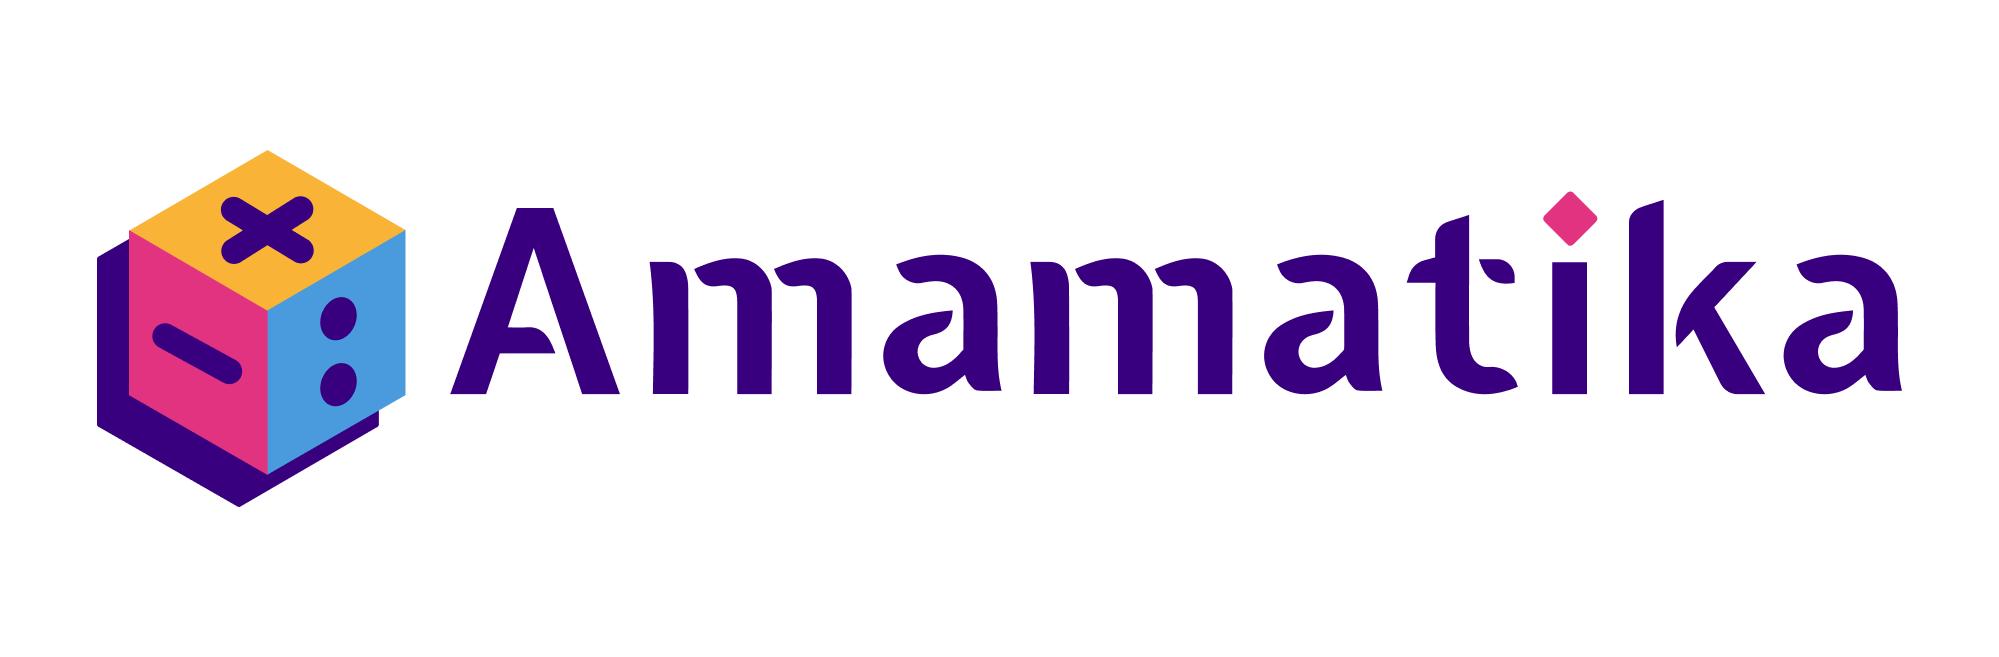 Amamatika лого.png